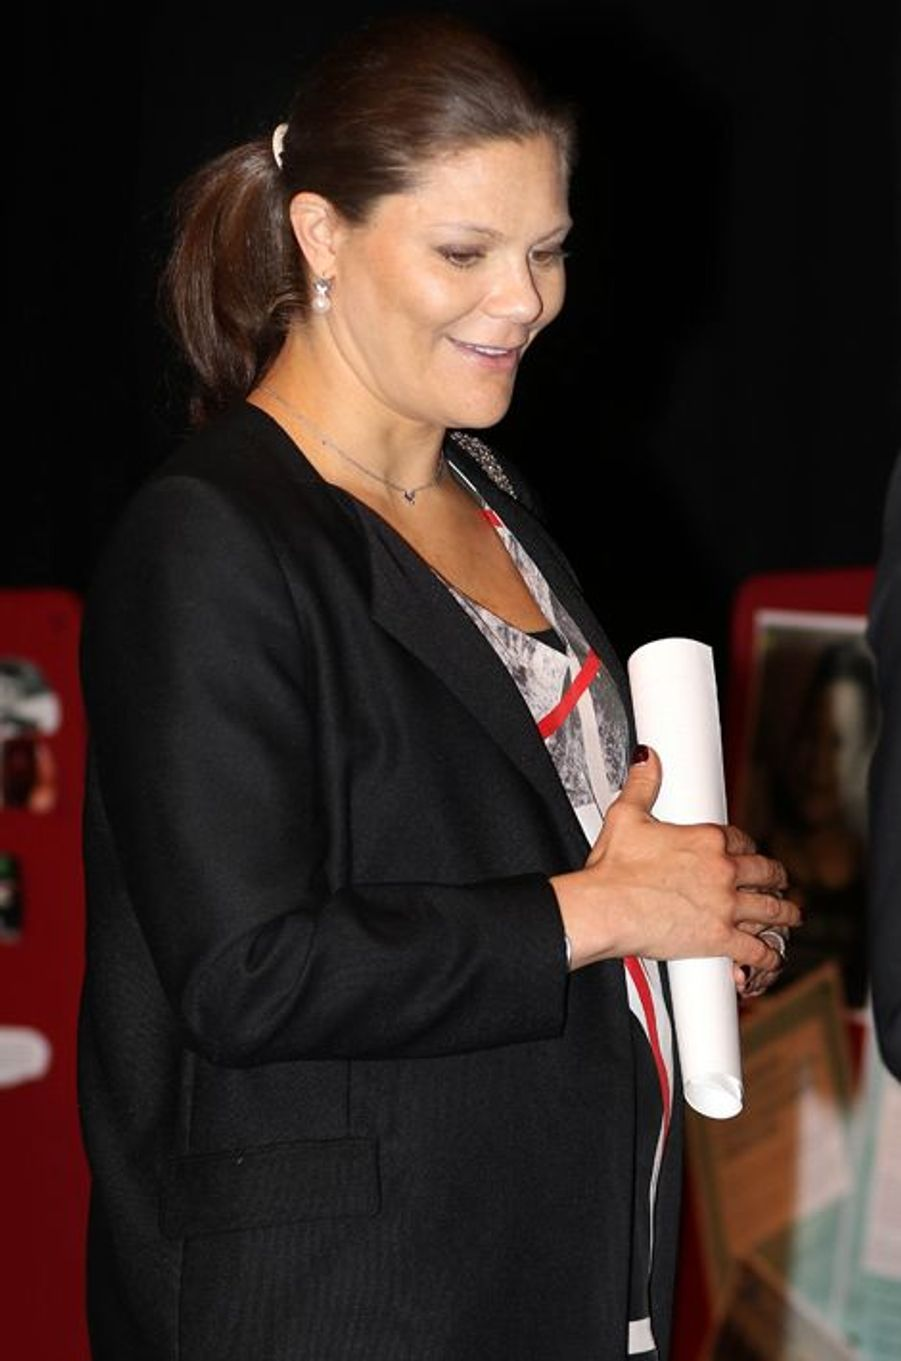 La princesse Victoria de Suède à Järfälla, le 25 janvier 2016